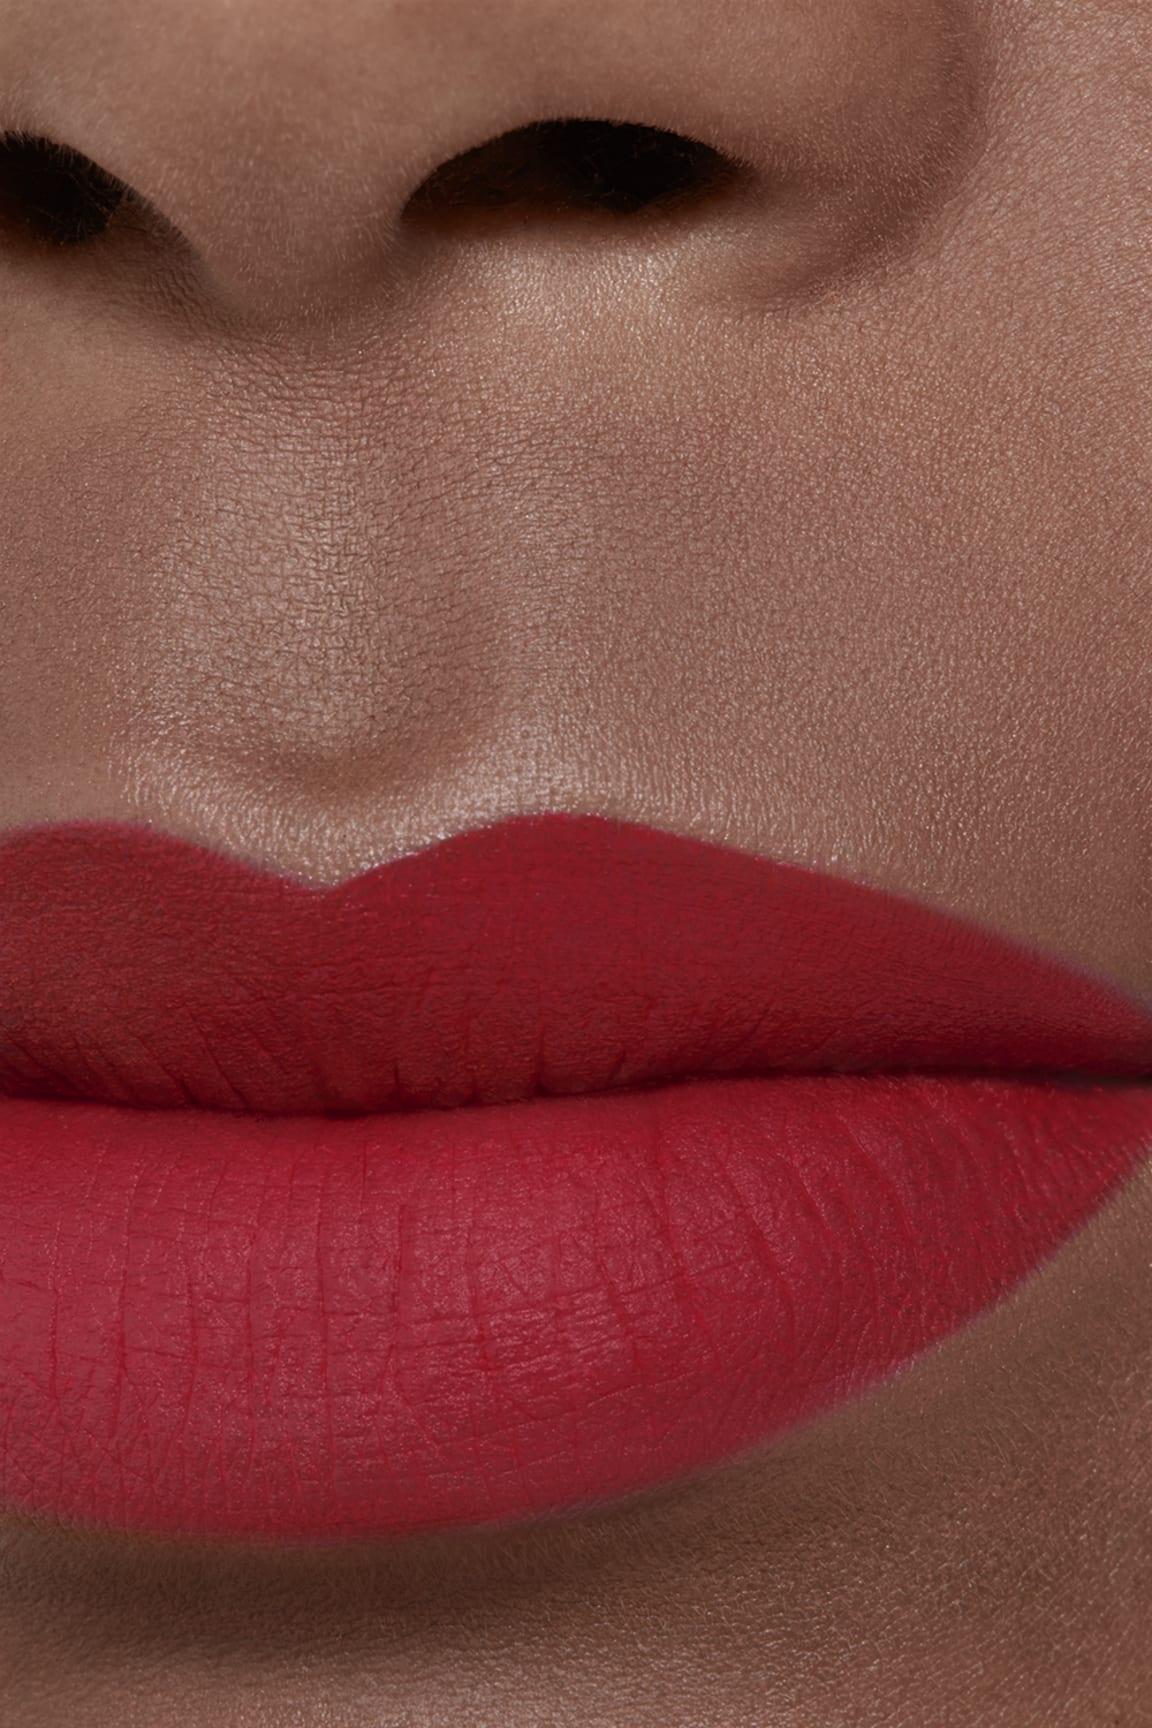 Application makeup visual 2 - ROUGE ALLURE VELVET EXTRÊME 112 - IDÉAL